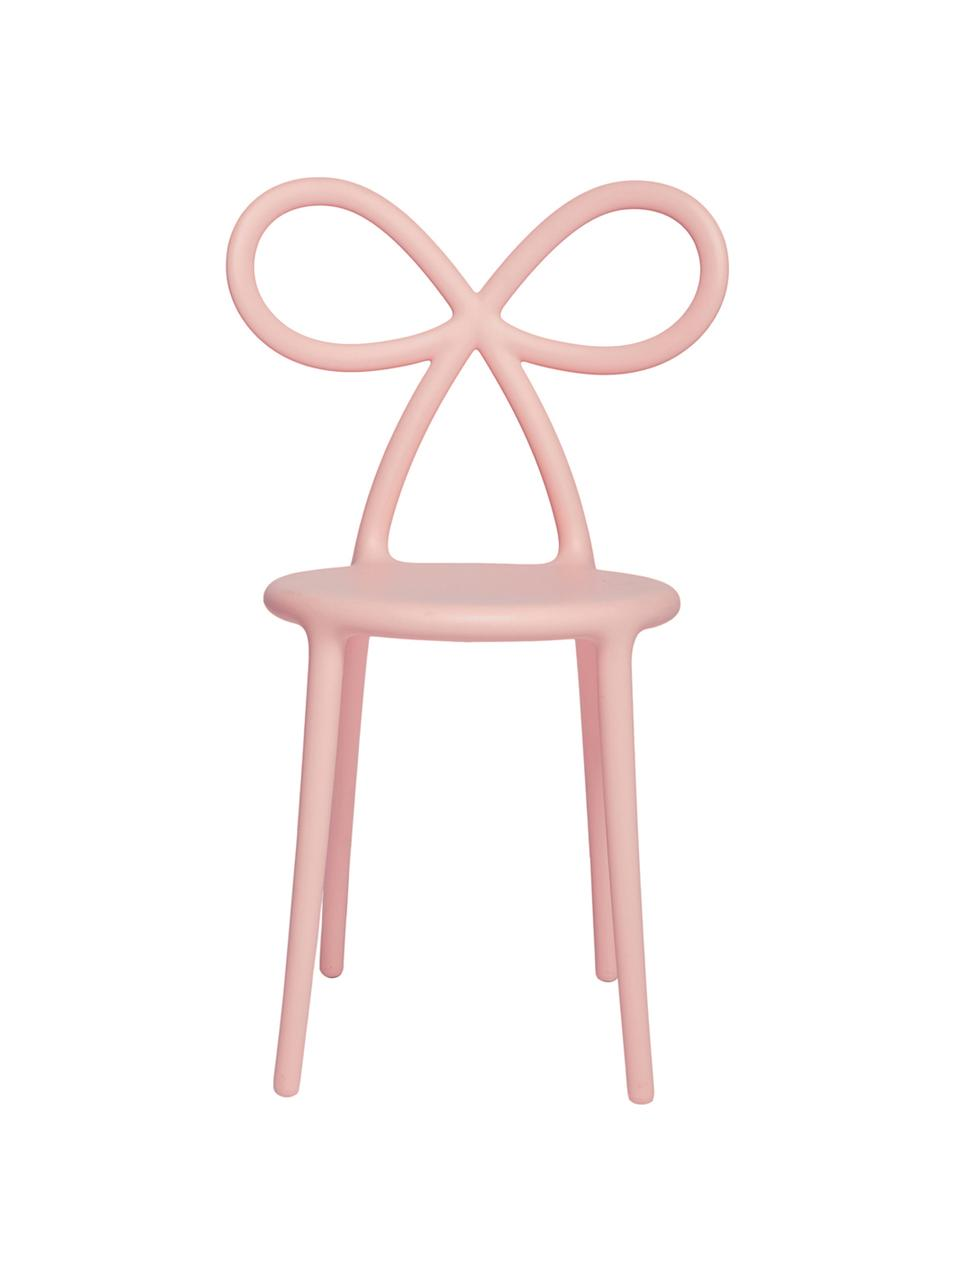 Sedia color rosa Ribbon, Plastica (polipropilene), Rosa, Larg. 53 x Prof. 52 cm